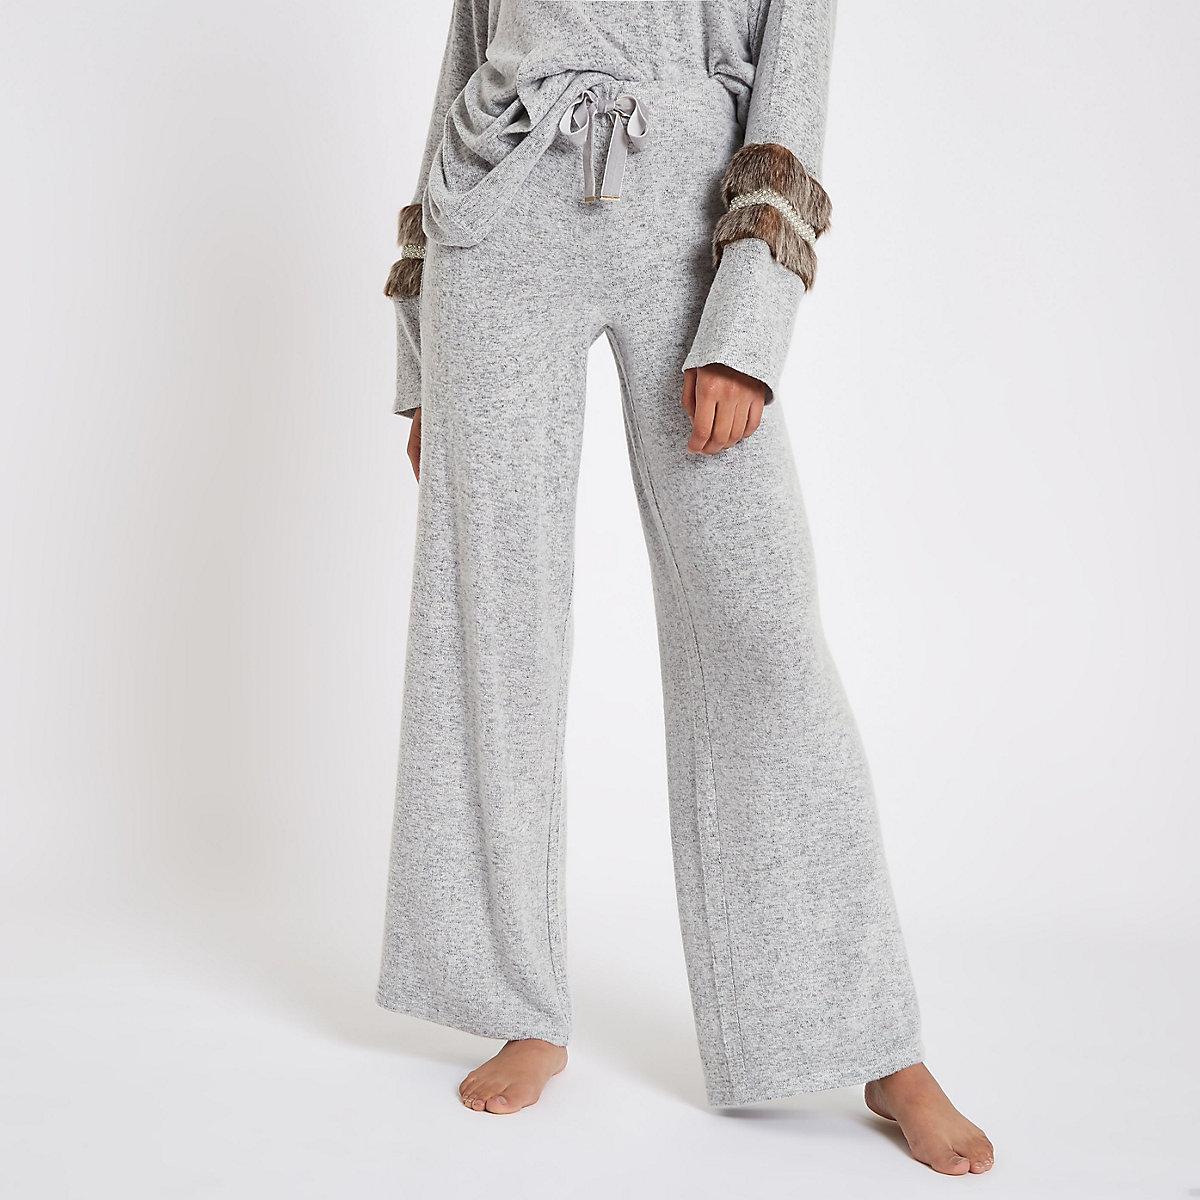 Grey soft jersey wide leg pants